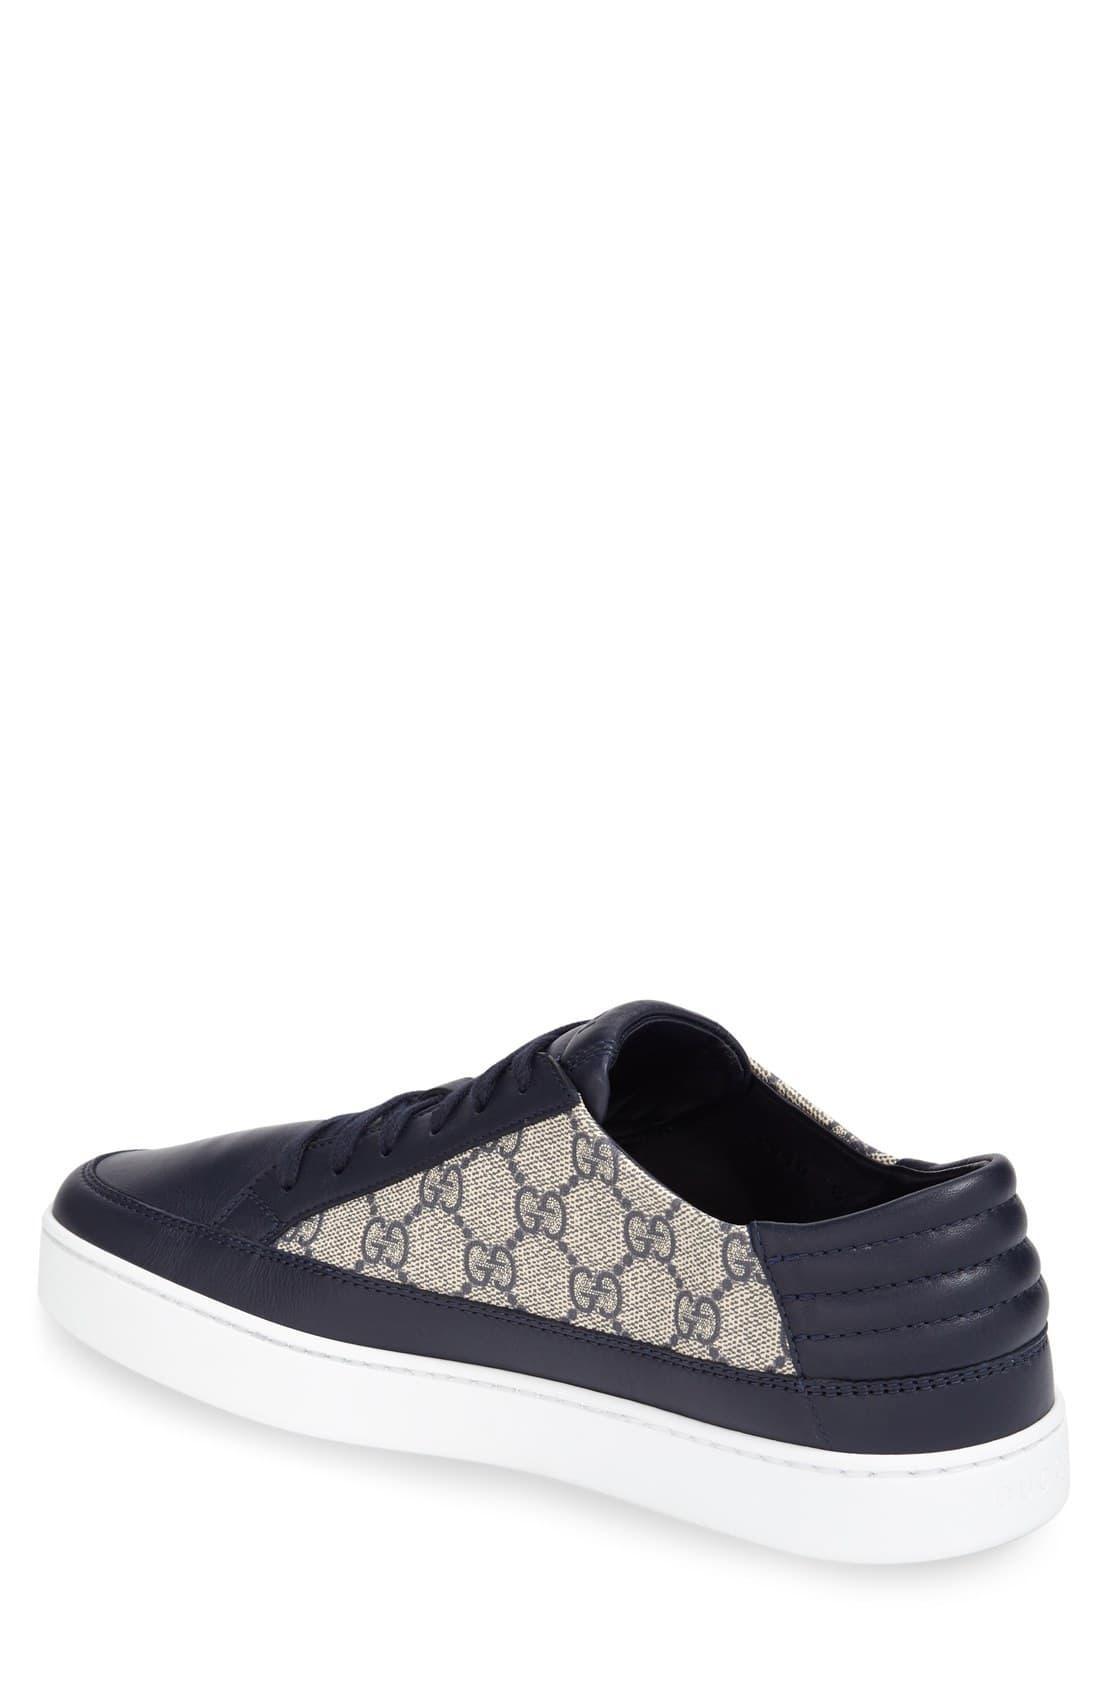 96973d2c735c5b Gucci 'Common' Low-top Sneaker in Gray for Men - Lyst